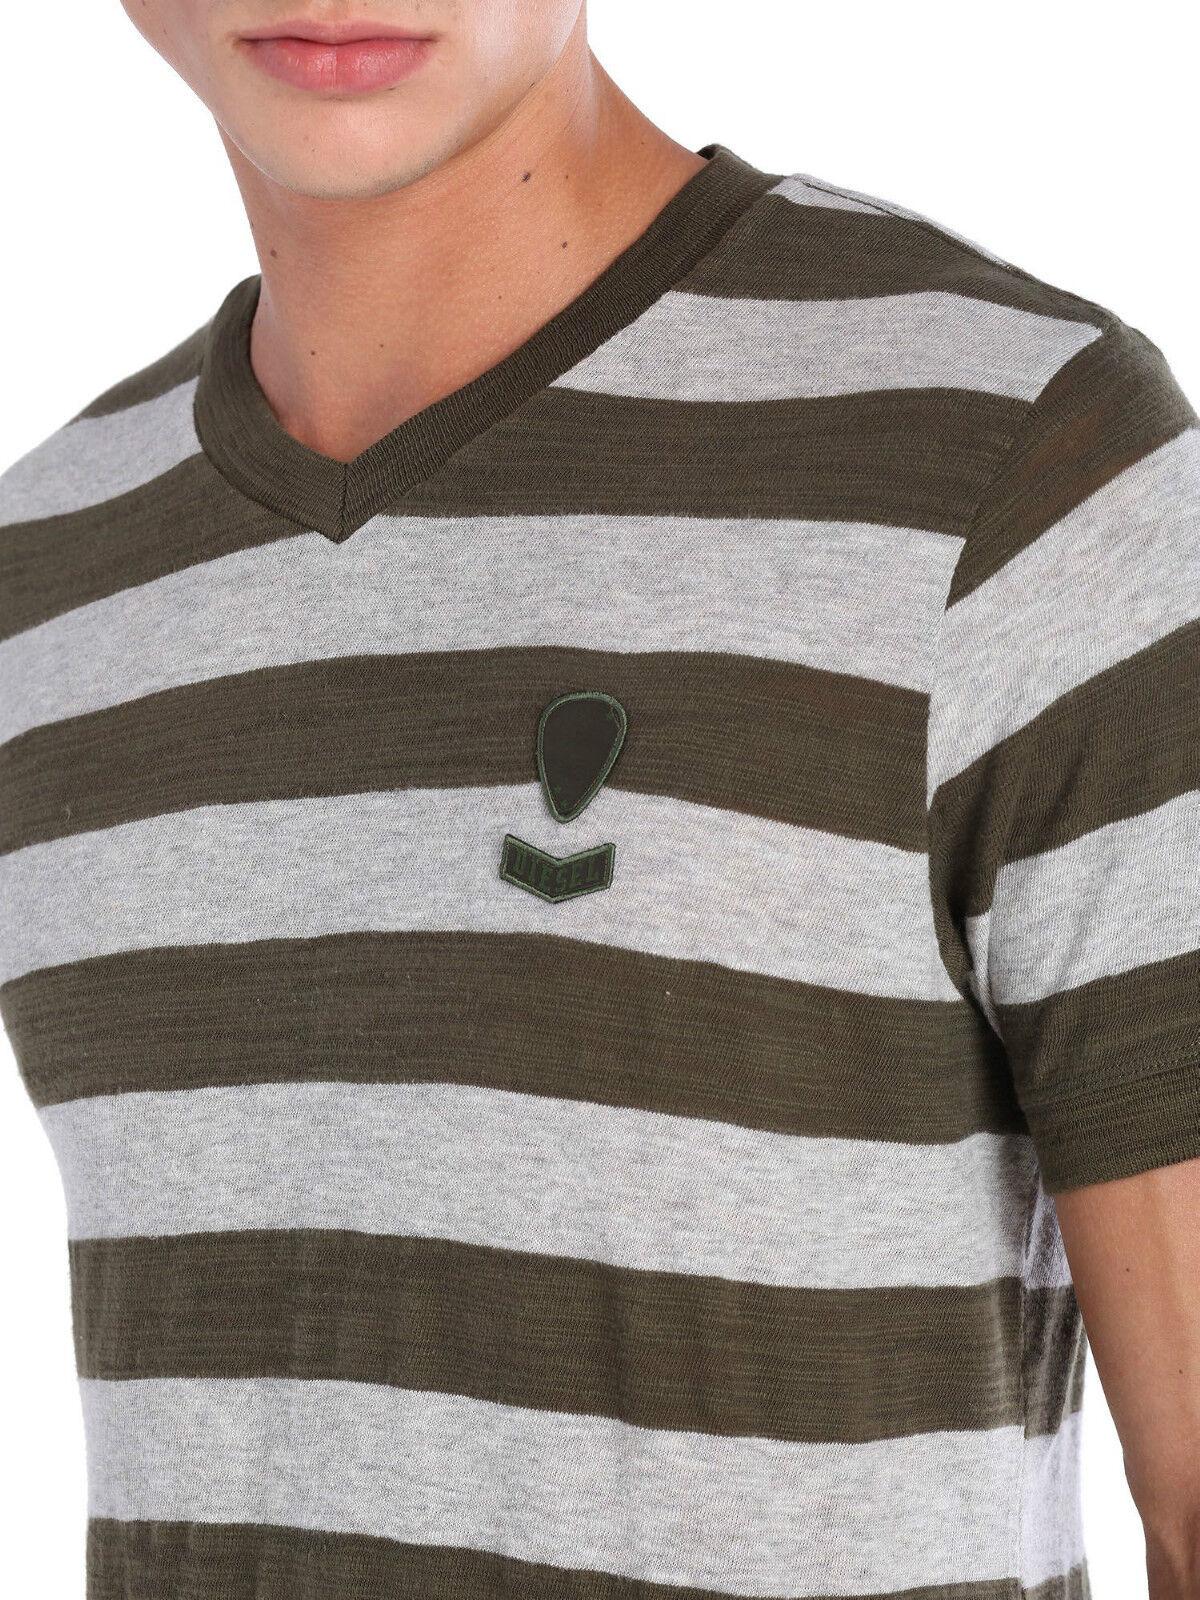 Camiseta Talla Logo Jeep®, Talla Camiseta XL, 121KMXL 6bdd06